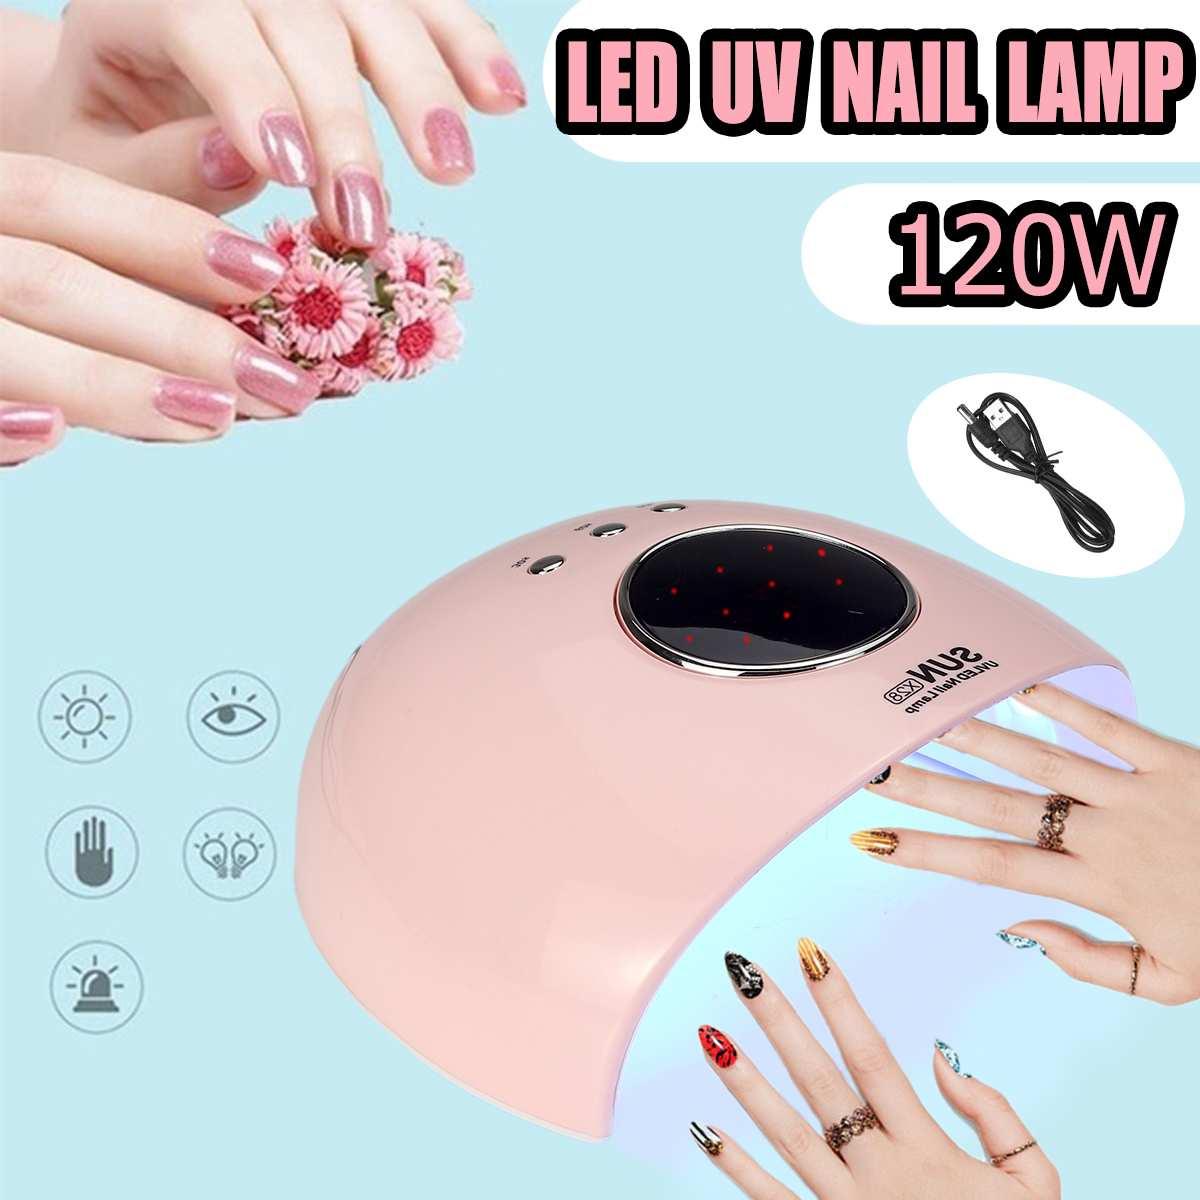 120W UV Lamp Led Nail Lamp Gel Nail Polish Curings Light Machine Nail Manicure Art LED Nail Dryer with Sensor USB Charge Nail